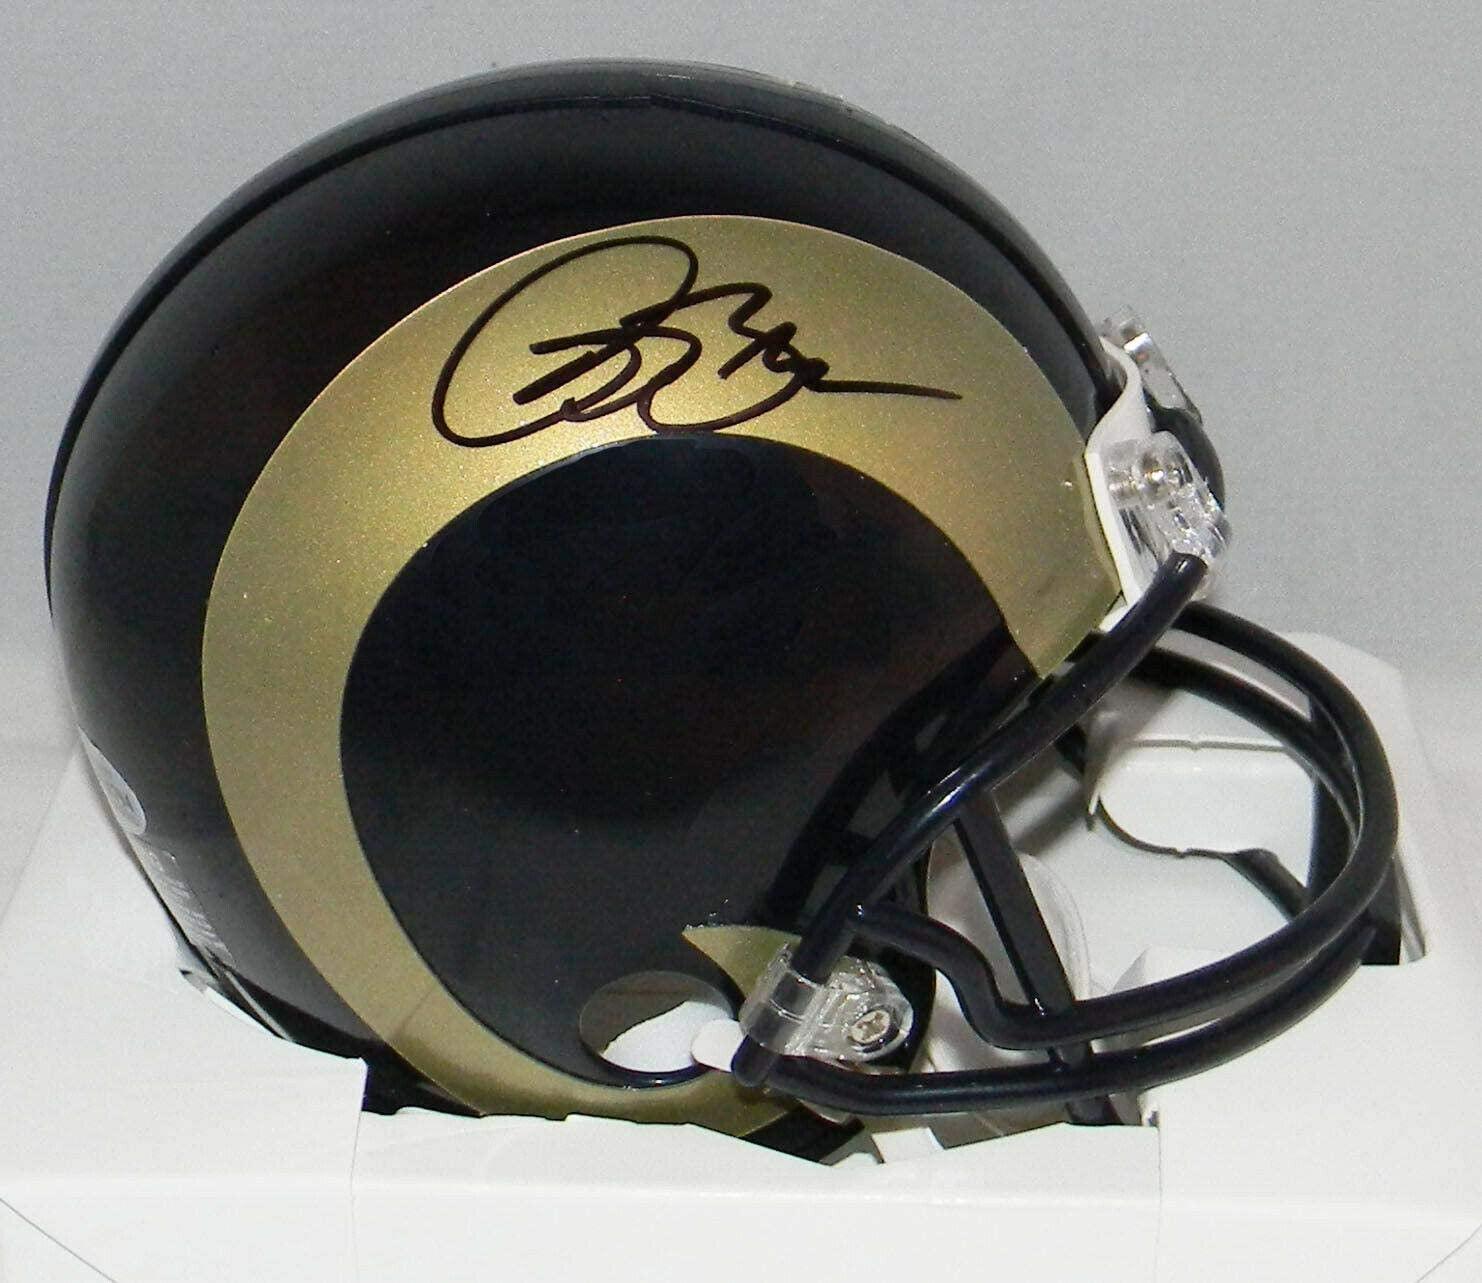 Isaac Bruce Signed Mini Helmet - Beckett - Beckett Authentication - Autographed NFL Mini Helmets